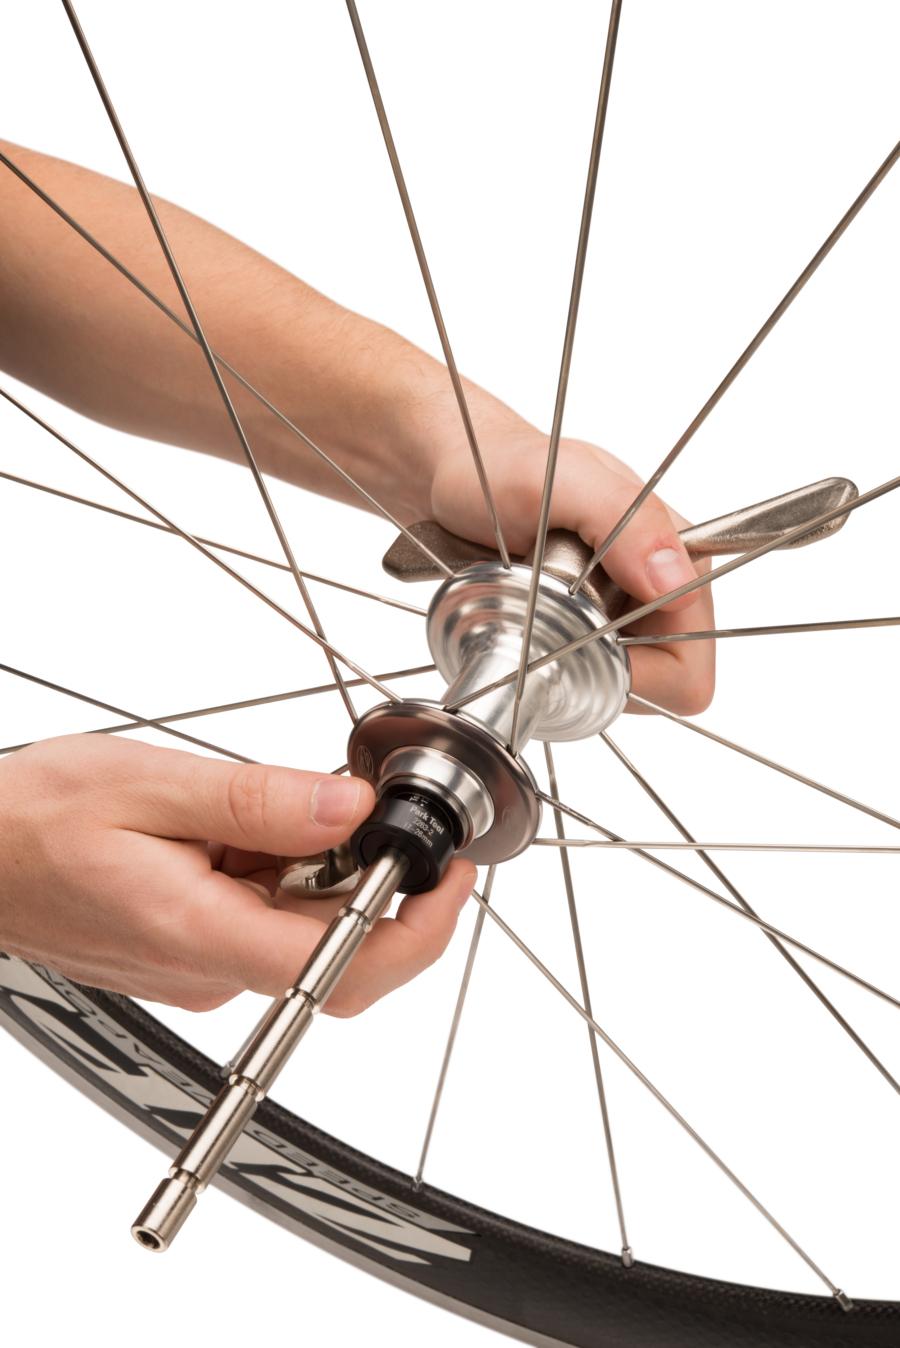 The Park Tool HBP-1 Hub Bearing Press Set installing bearings inside road bike hub, enlarged